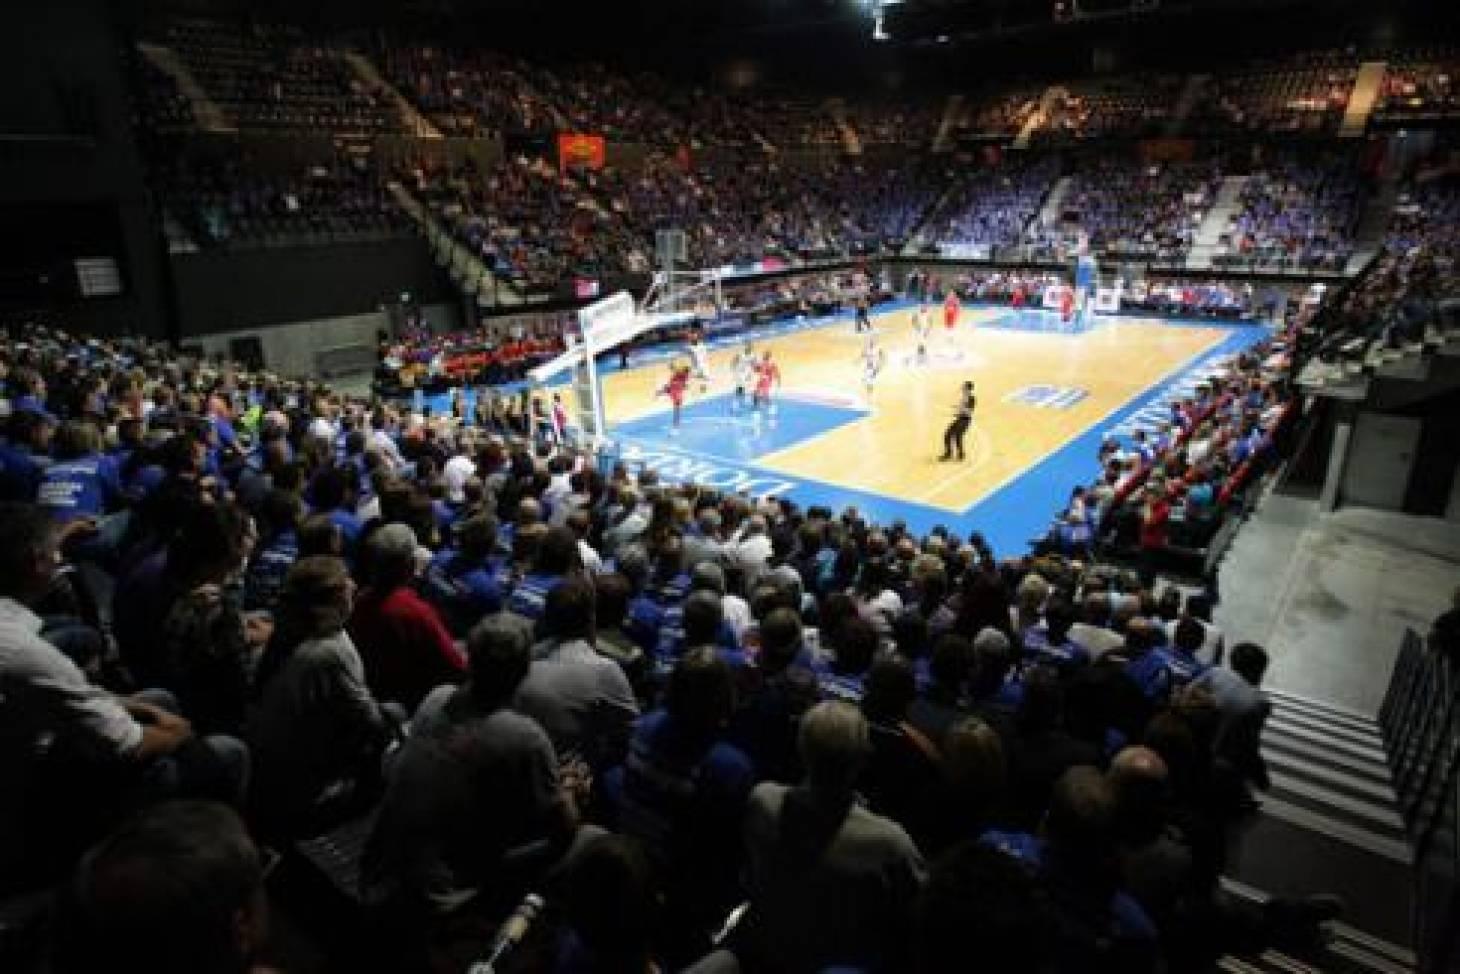 Une Arena de 6 000 places<br> au Futuroscope